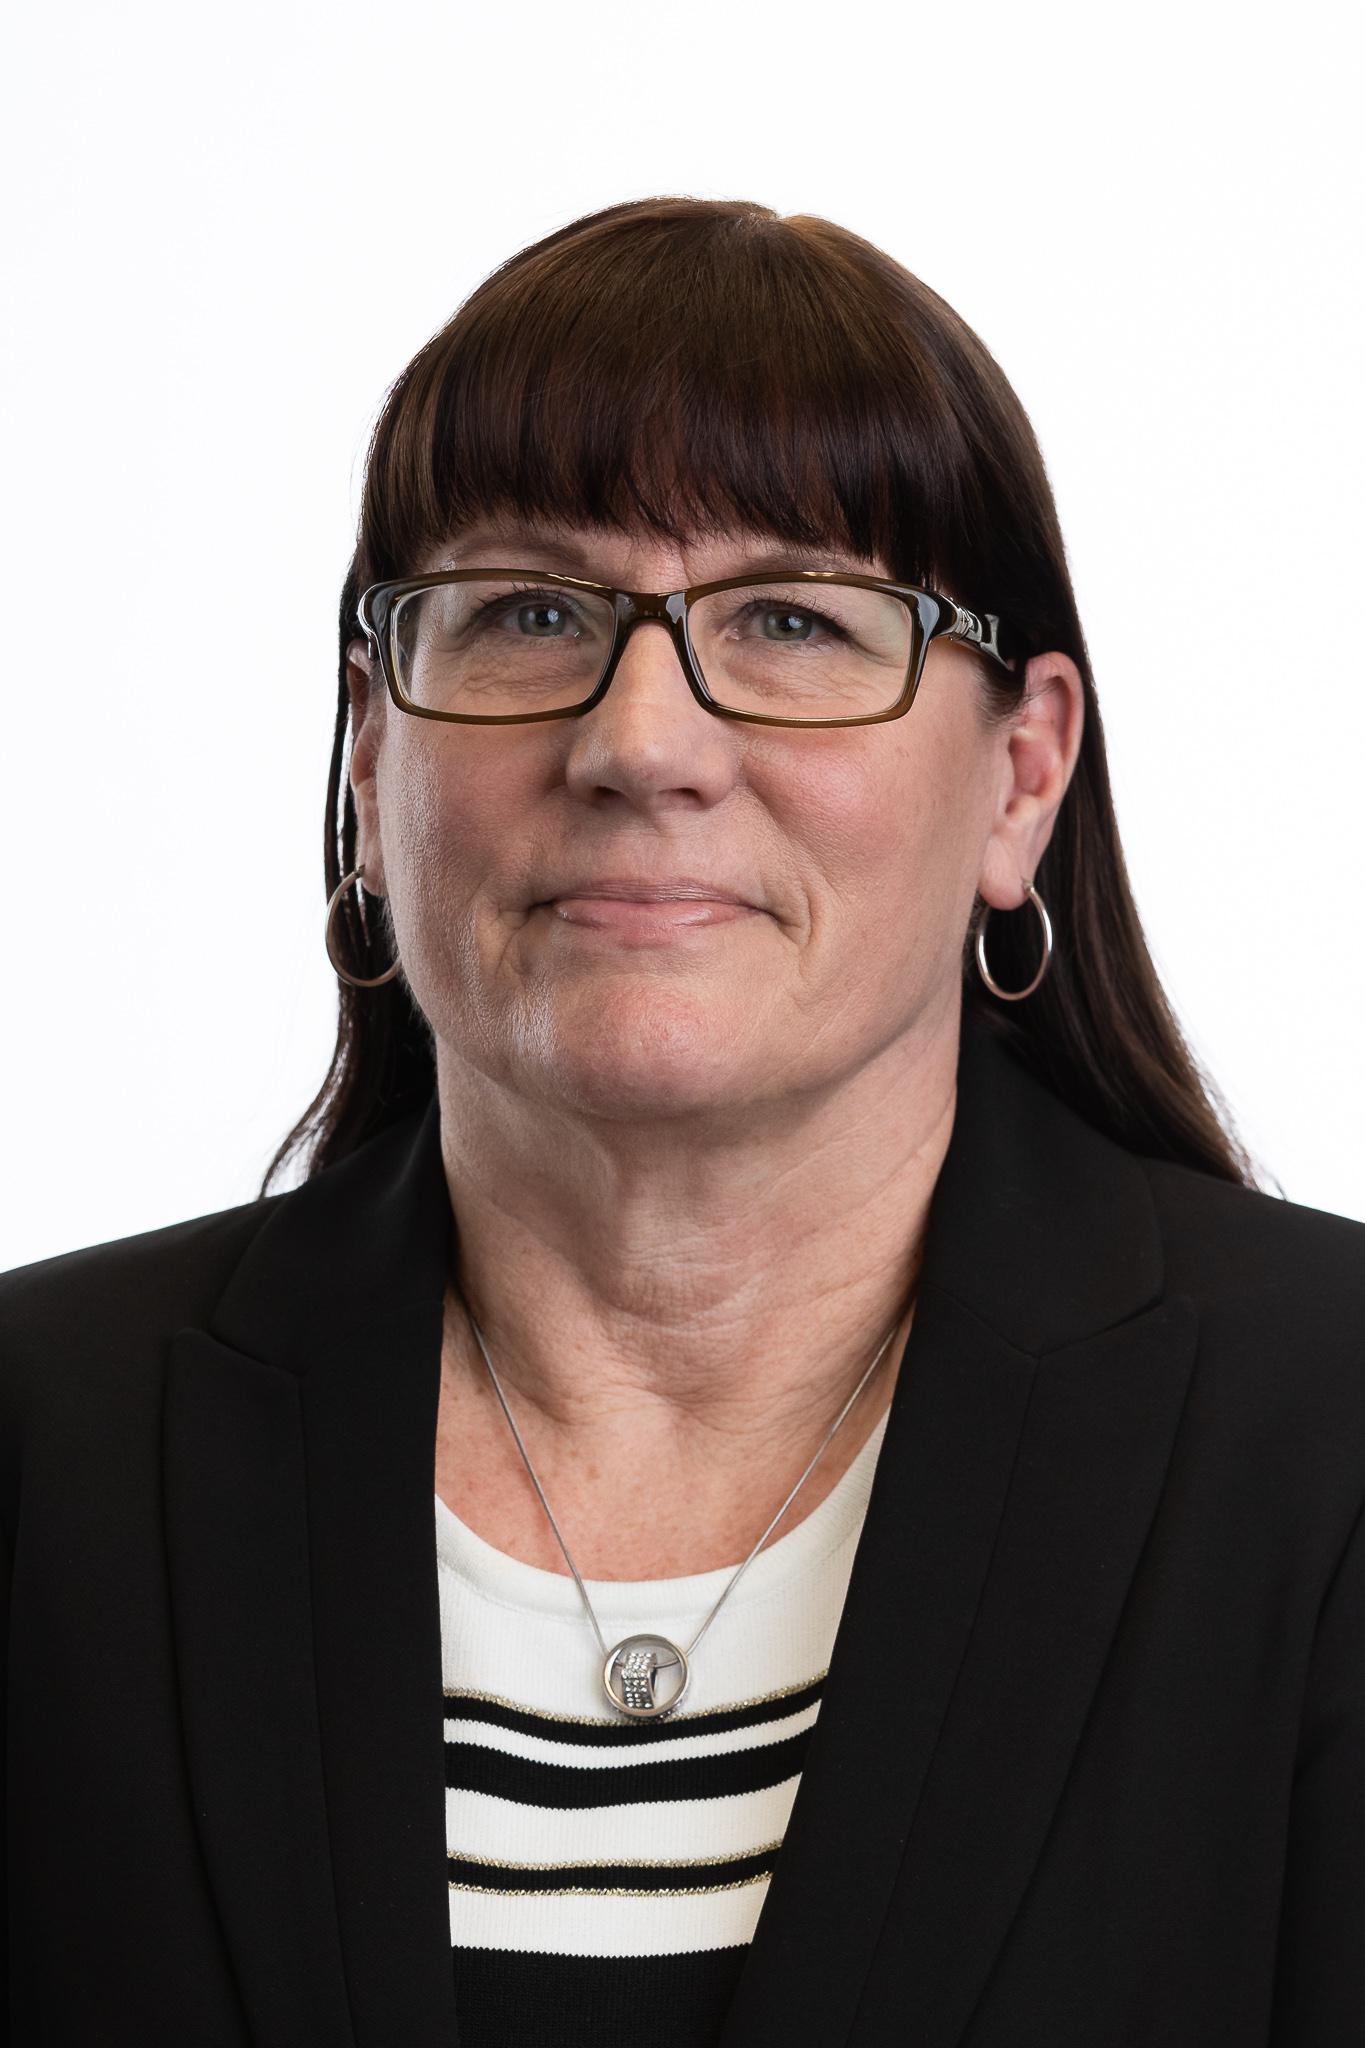 Headshot of Laurie Basiak